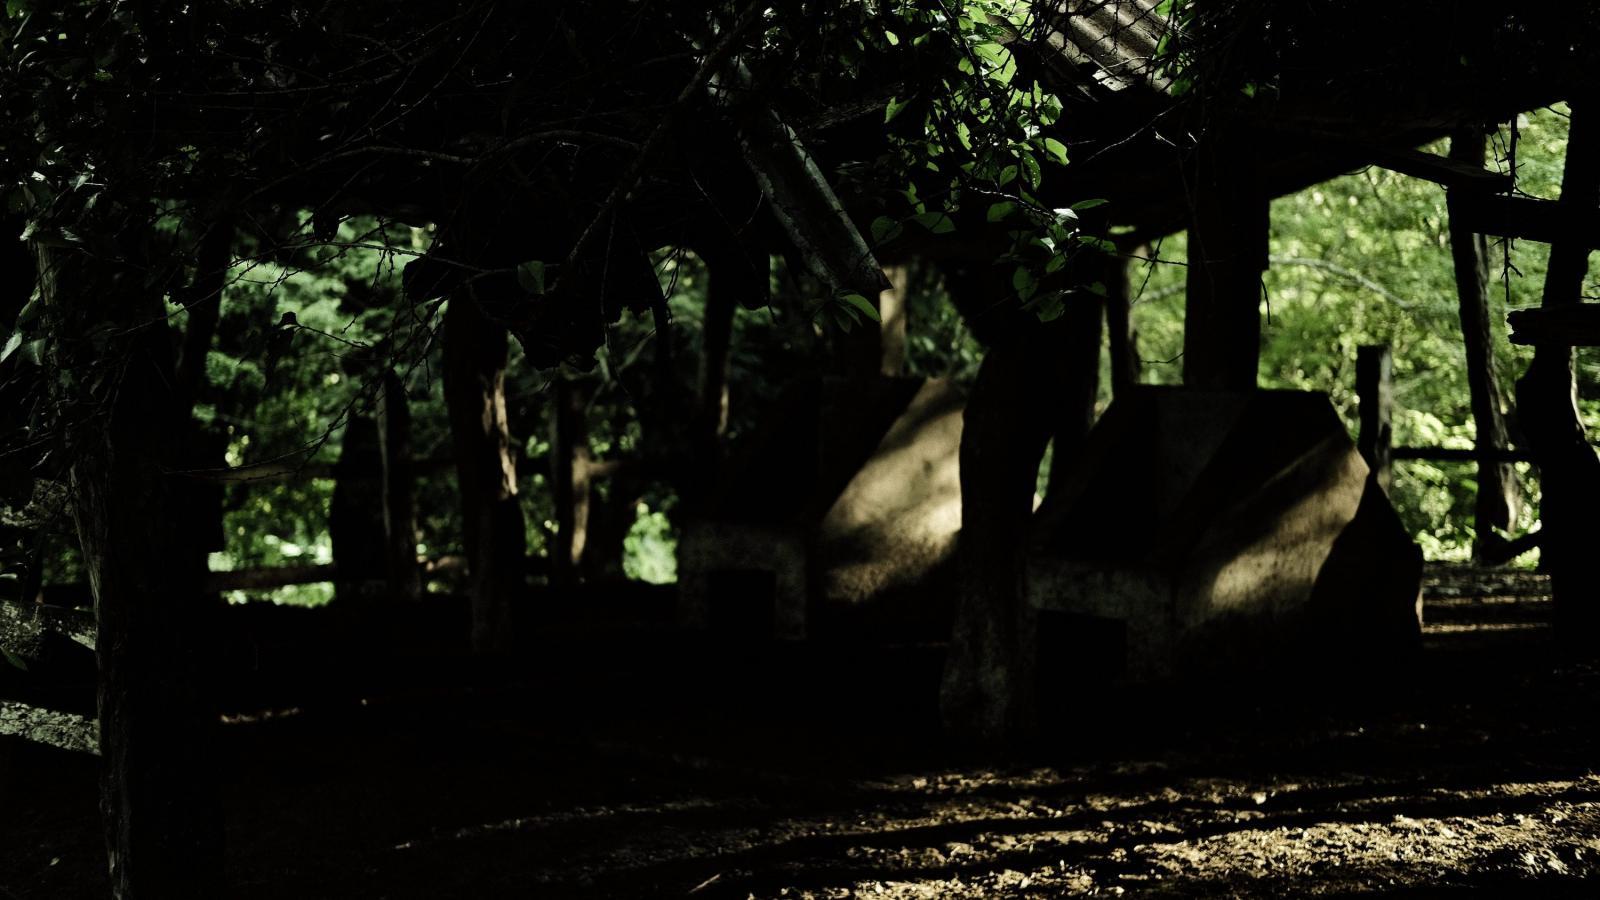 Photography image - Loading DSCF0433.JPG